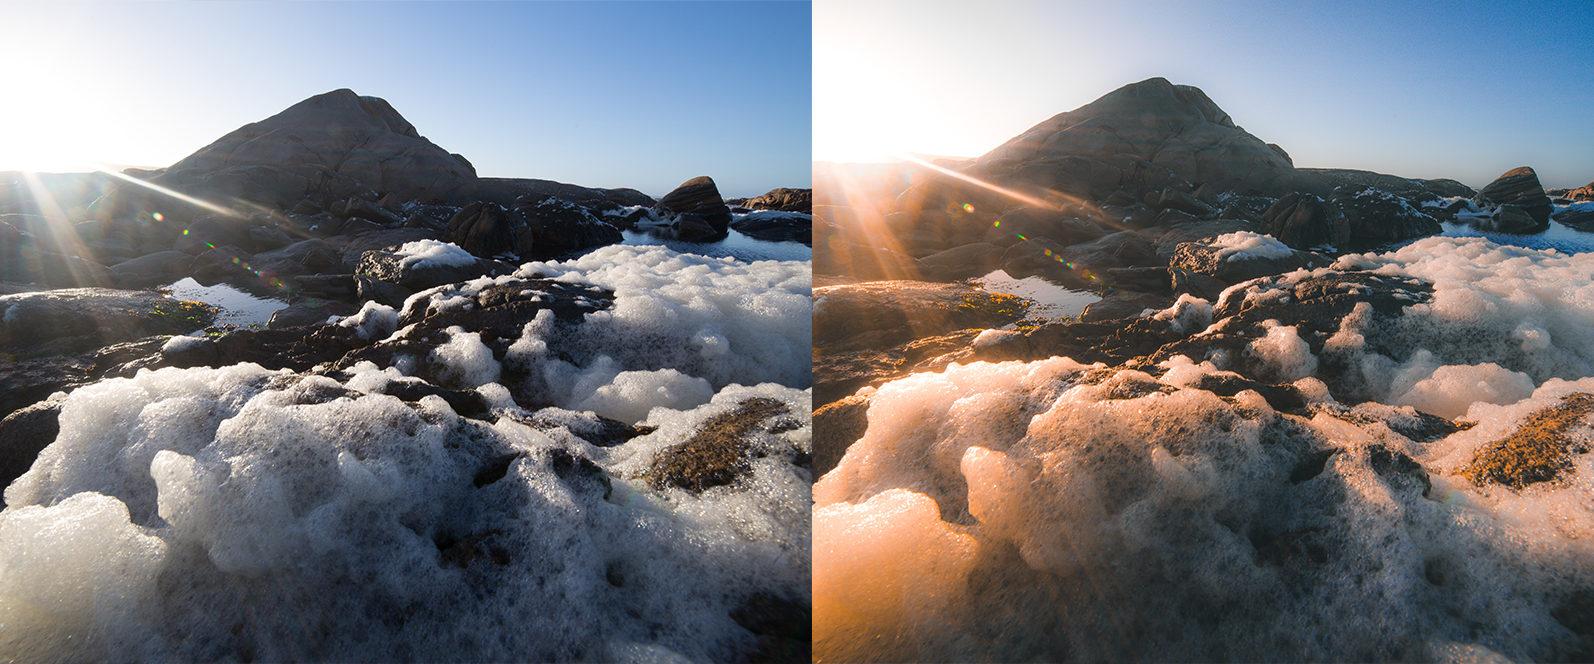 12 x Lightroom Presets, Cape Columbine, Beach and Ocean Presets, Seascape Presets - 6 Cape Columbine 2 -